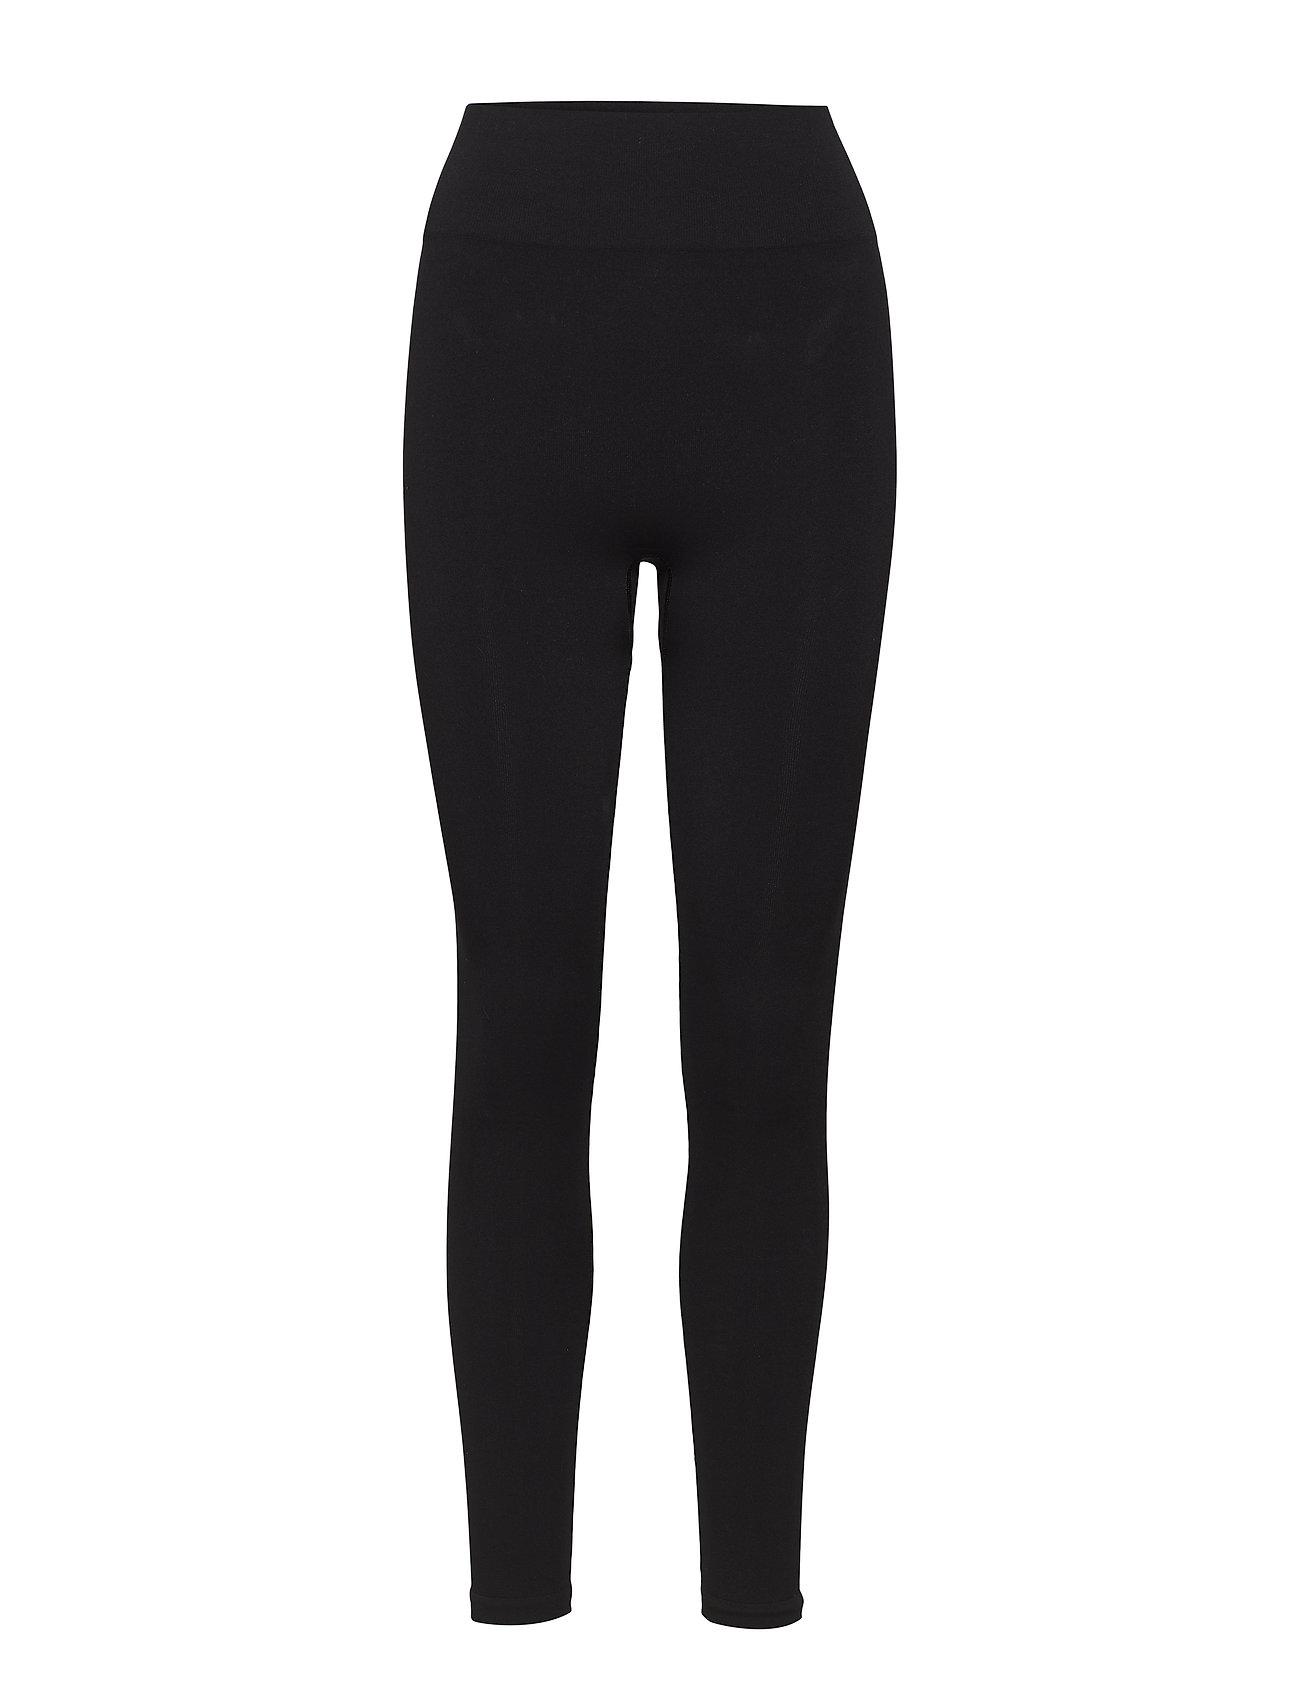 Filippa K Soft Sport Seamless Compression Legging - BLACK